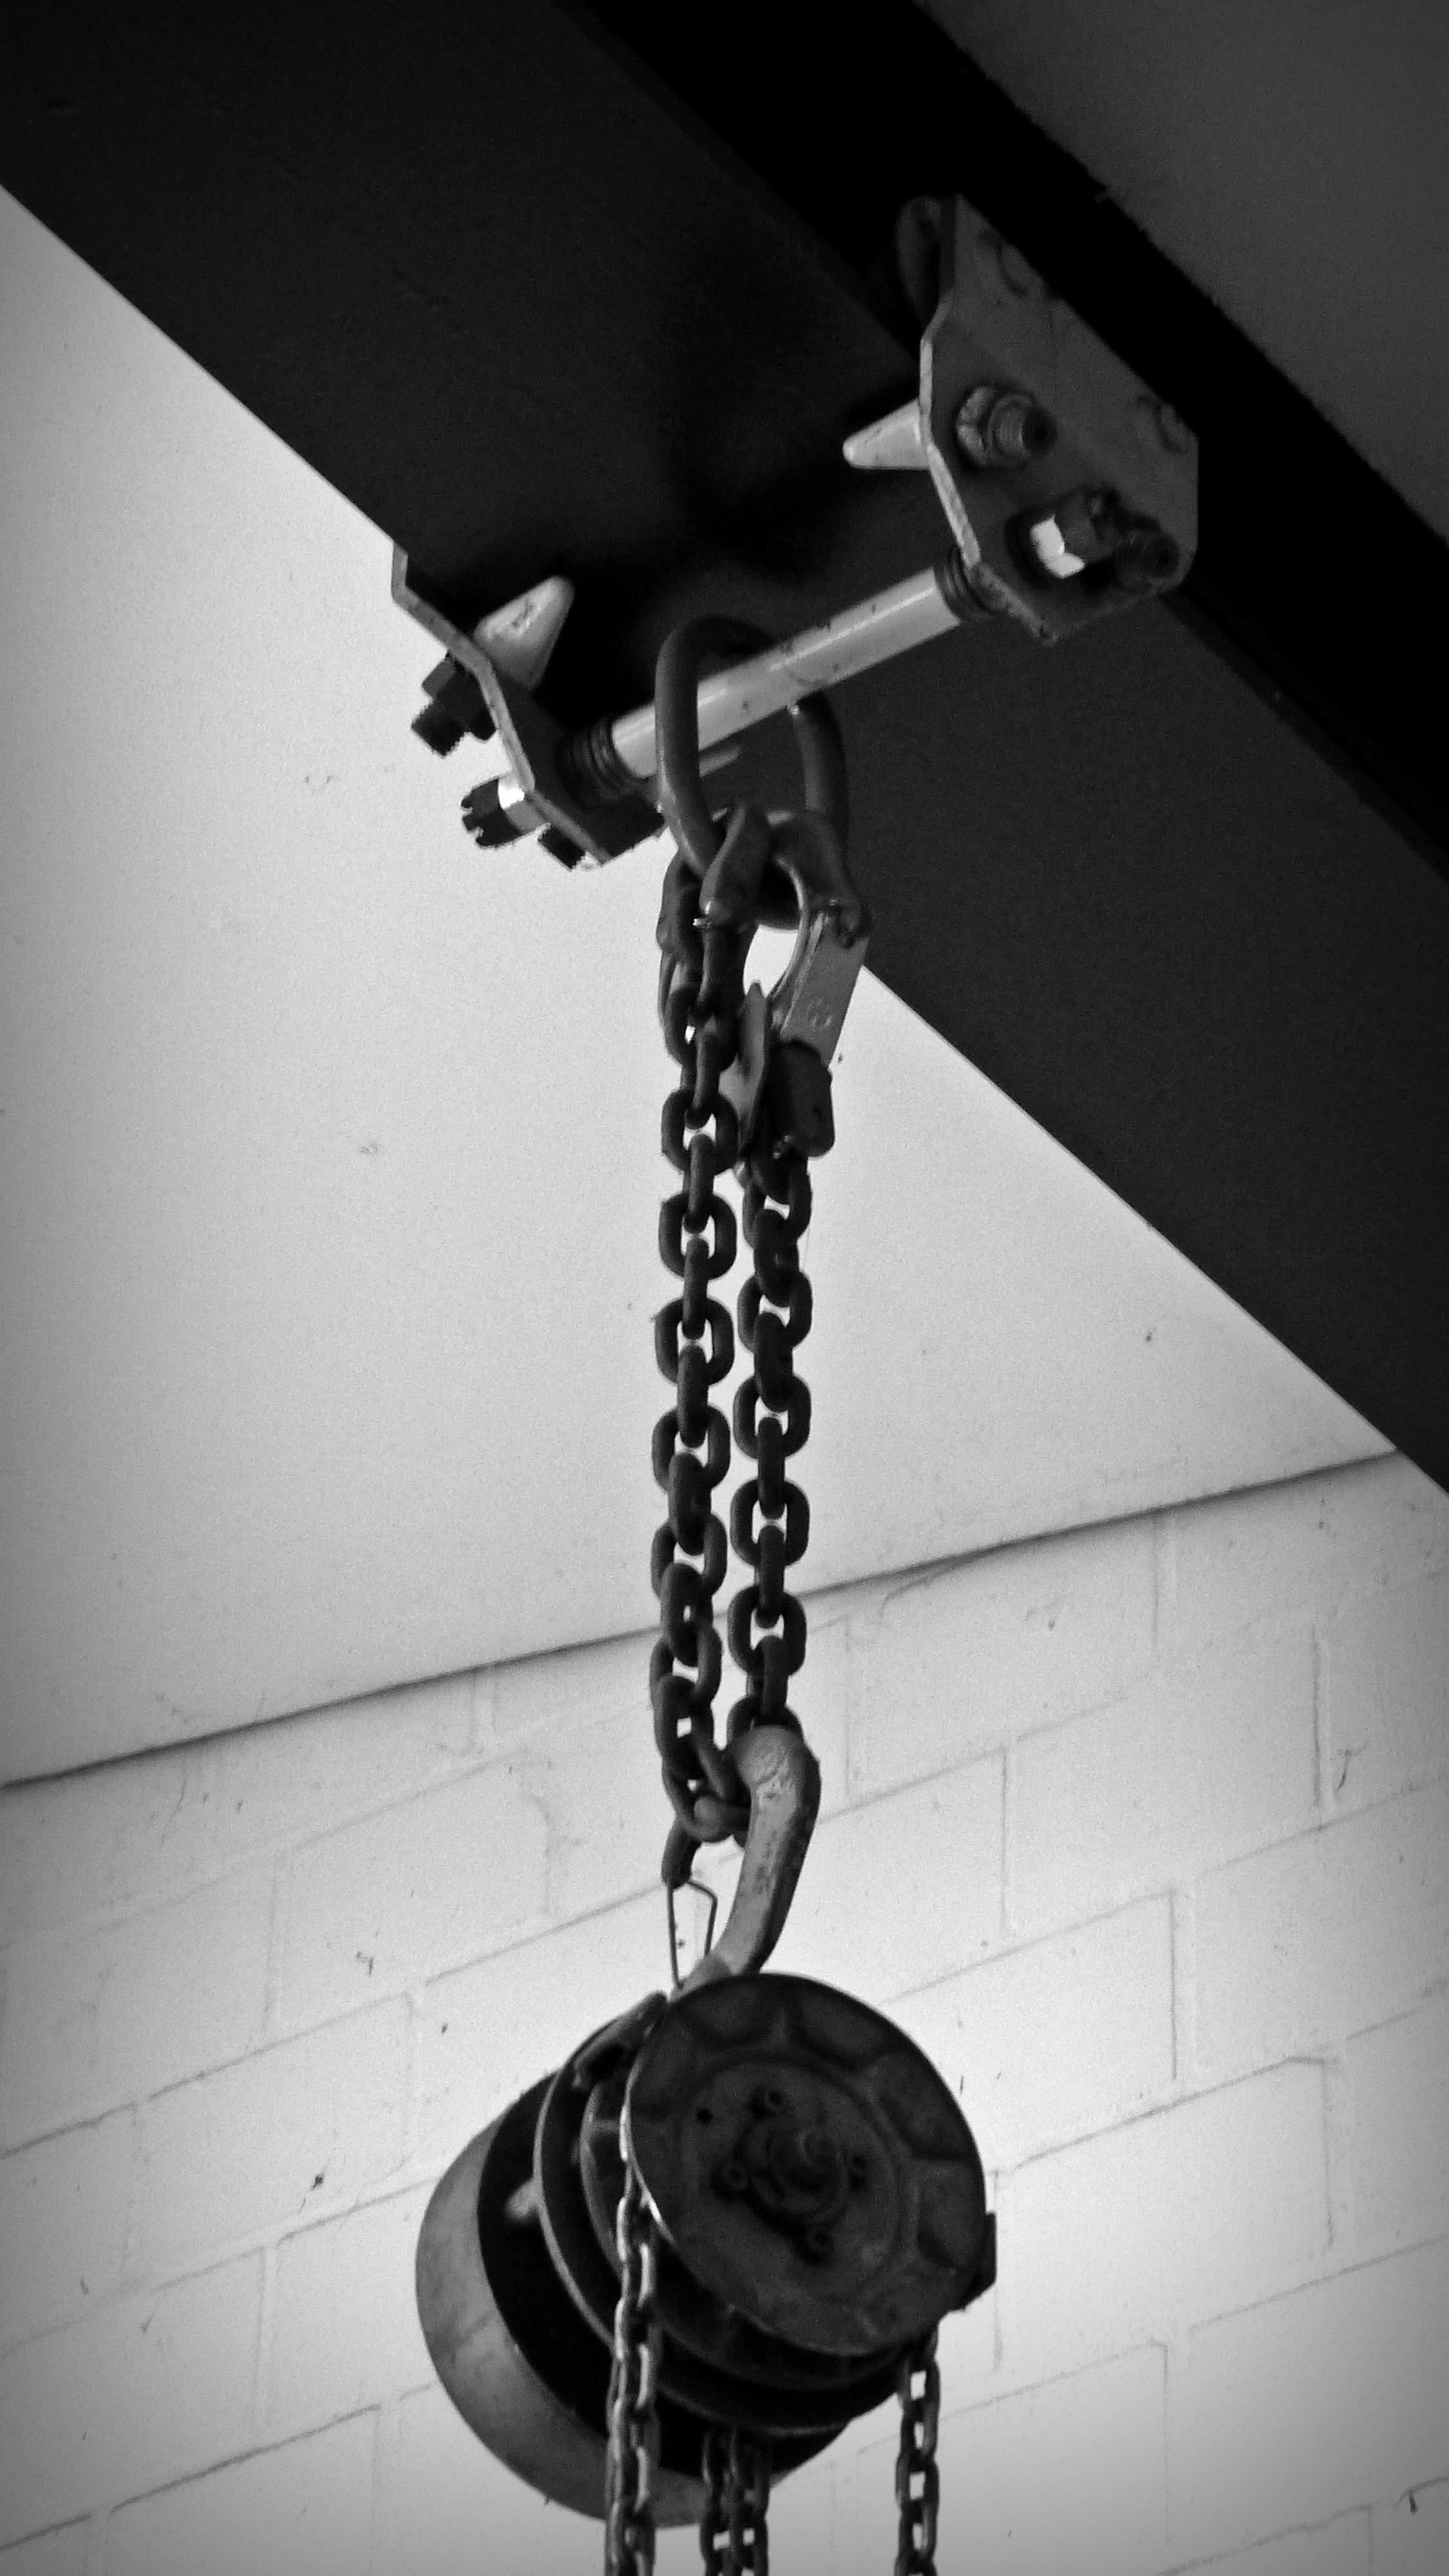 Light Black And White Photography Chain Steel Metal Monochrome Lighting Circle Raise Design Photograph